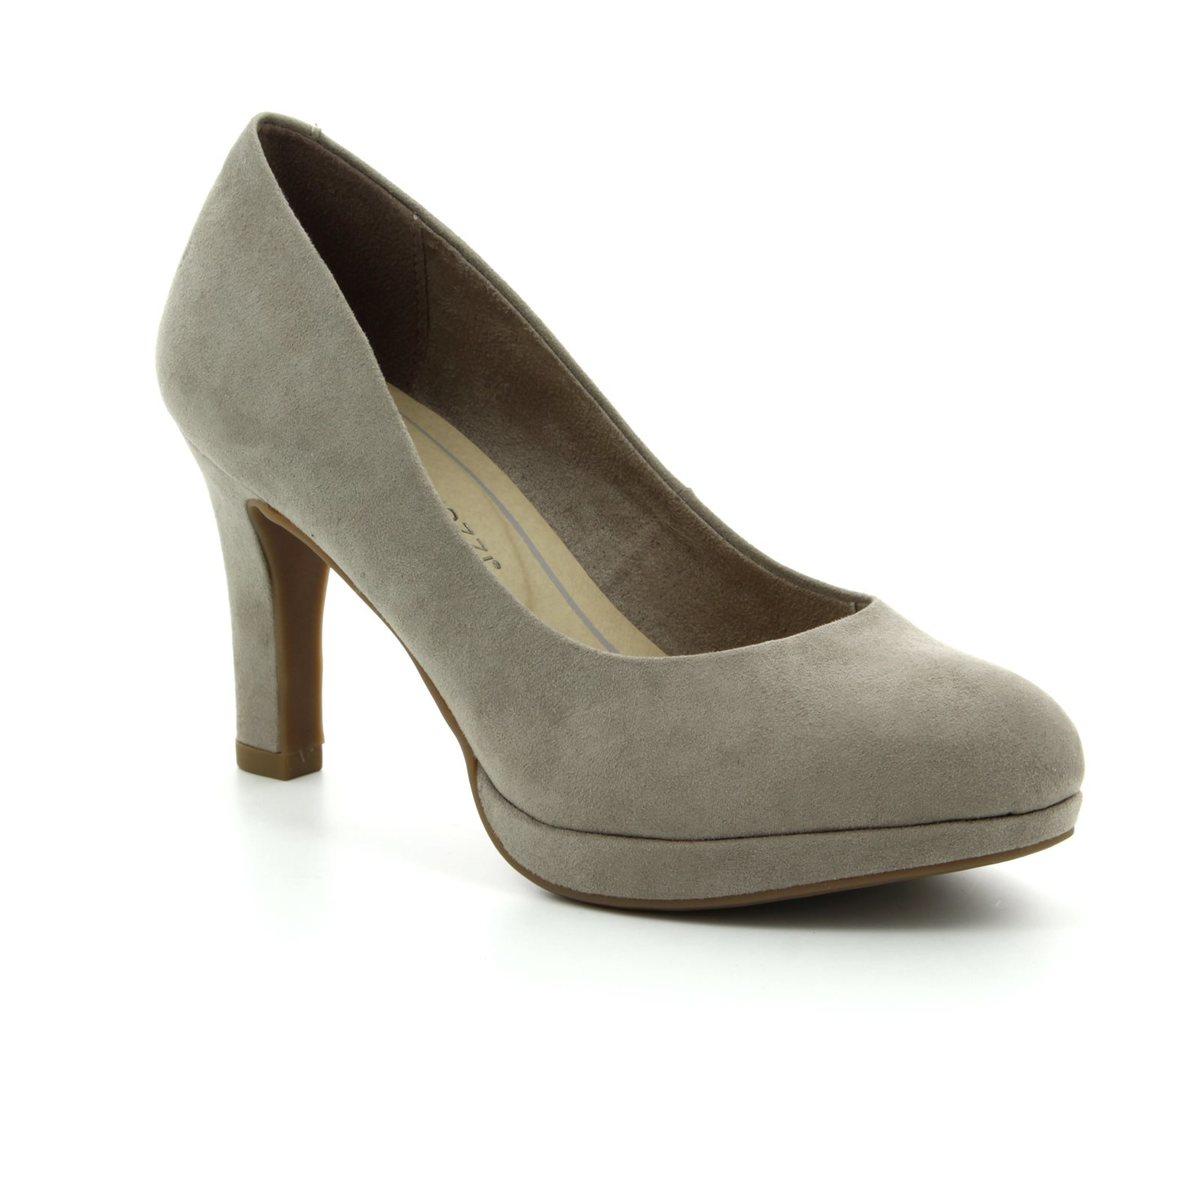 Marco Tozzi High-heeled Shoes - Taupe - 22417/20/341 BADAMI